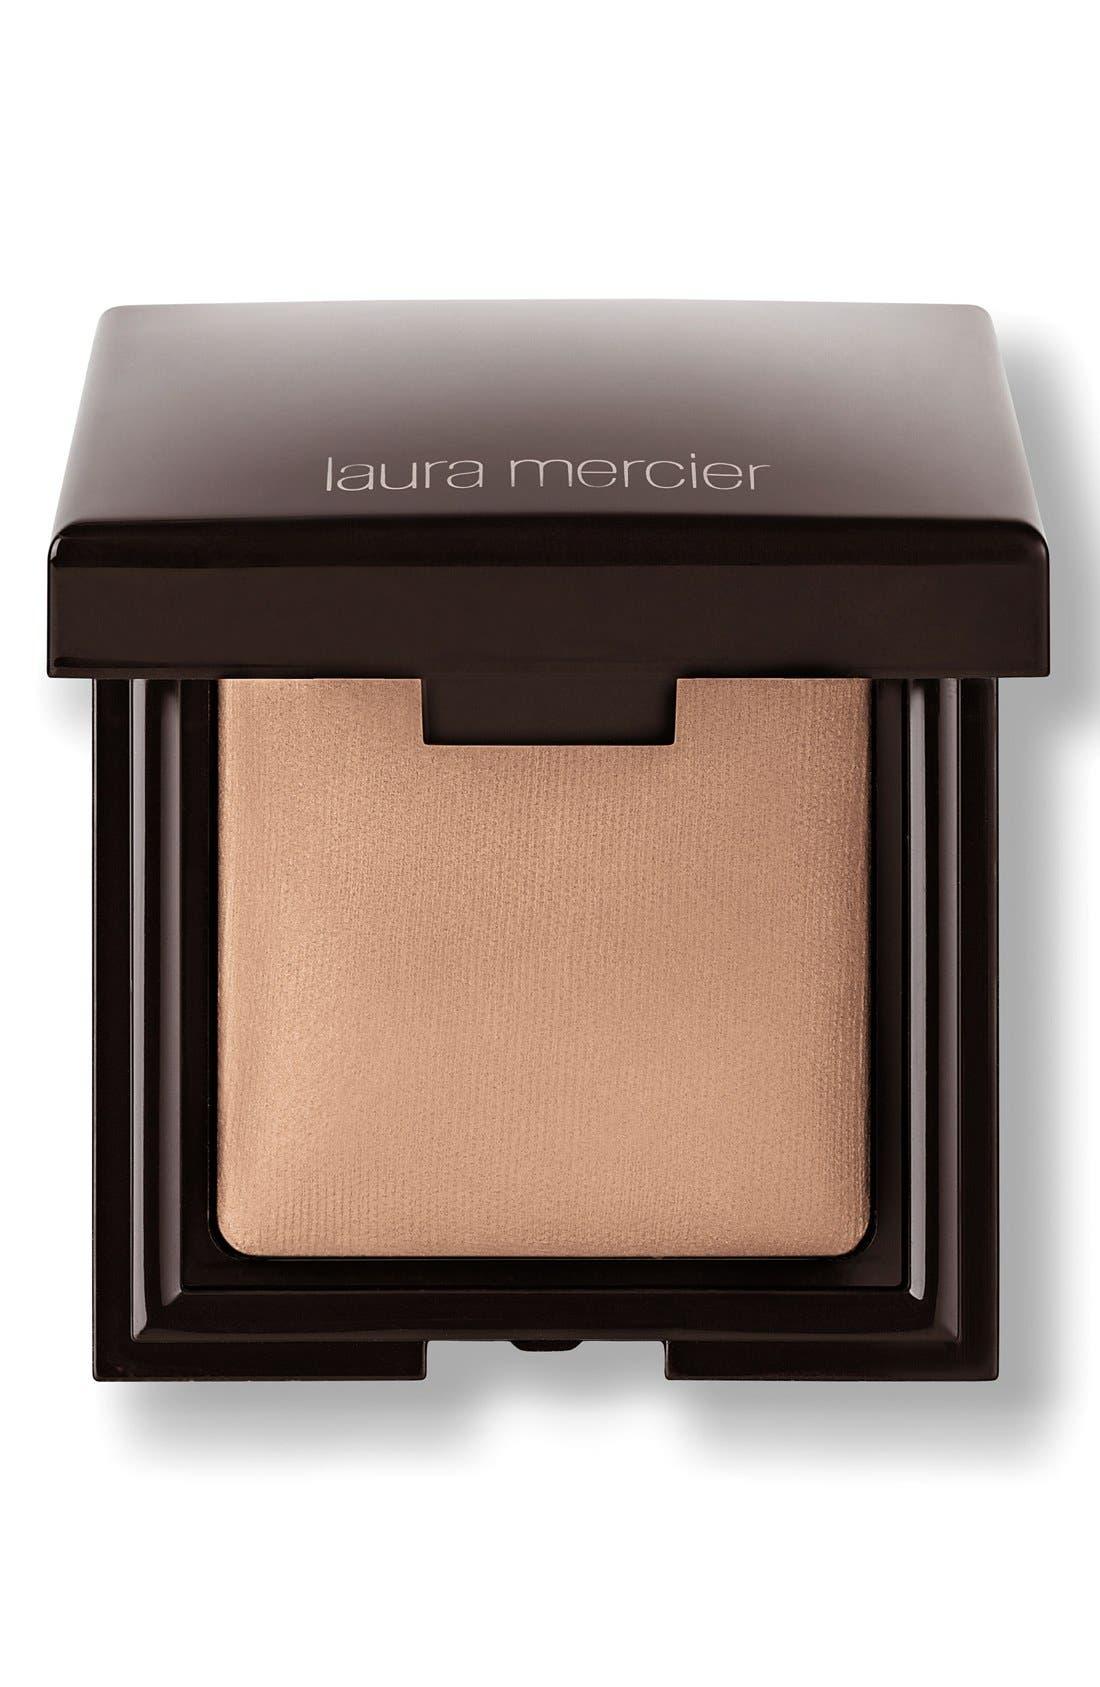 Laura Mercier 'Candleglow' Sheer Perfecting Powder